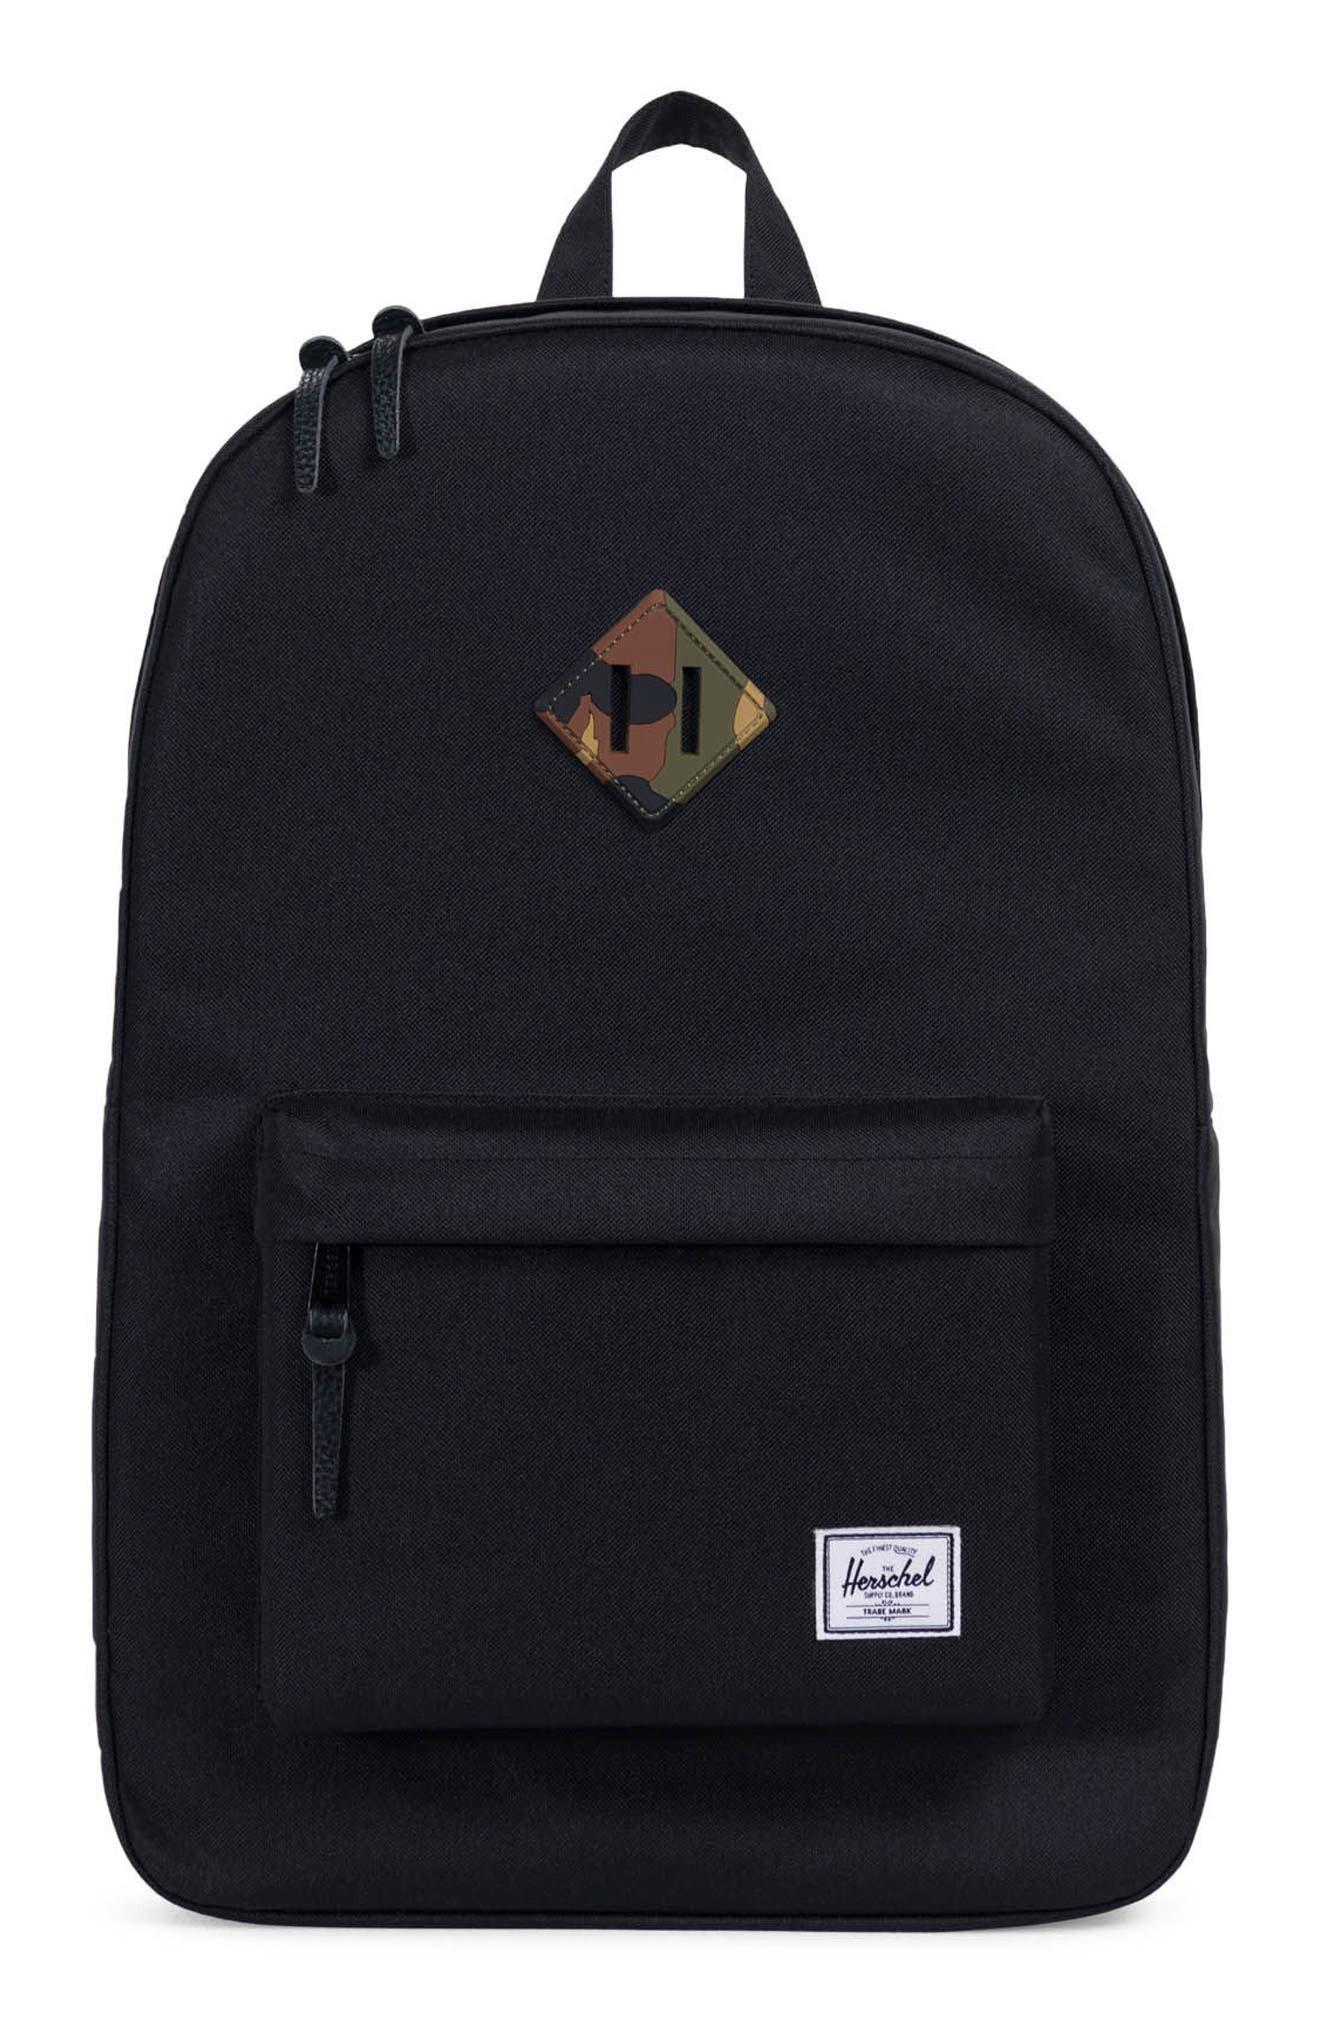 Heritage Reflective Backpack,                         Main,                         color, Black/ Woodland Camo